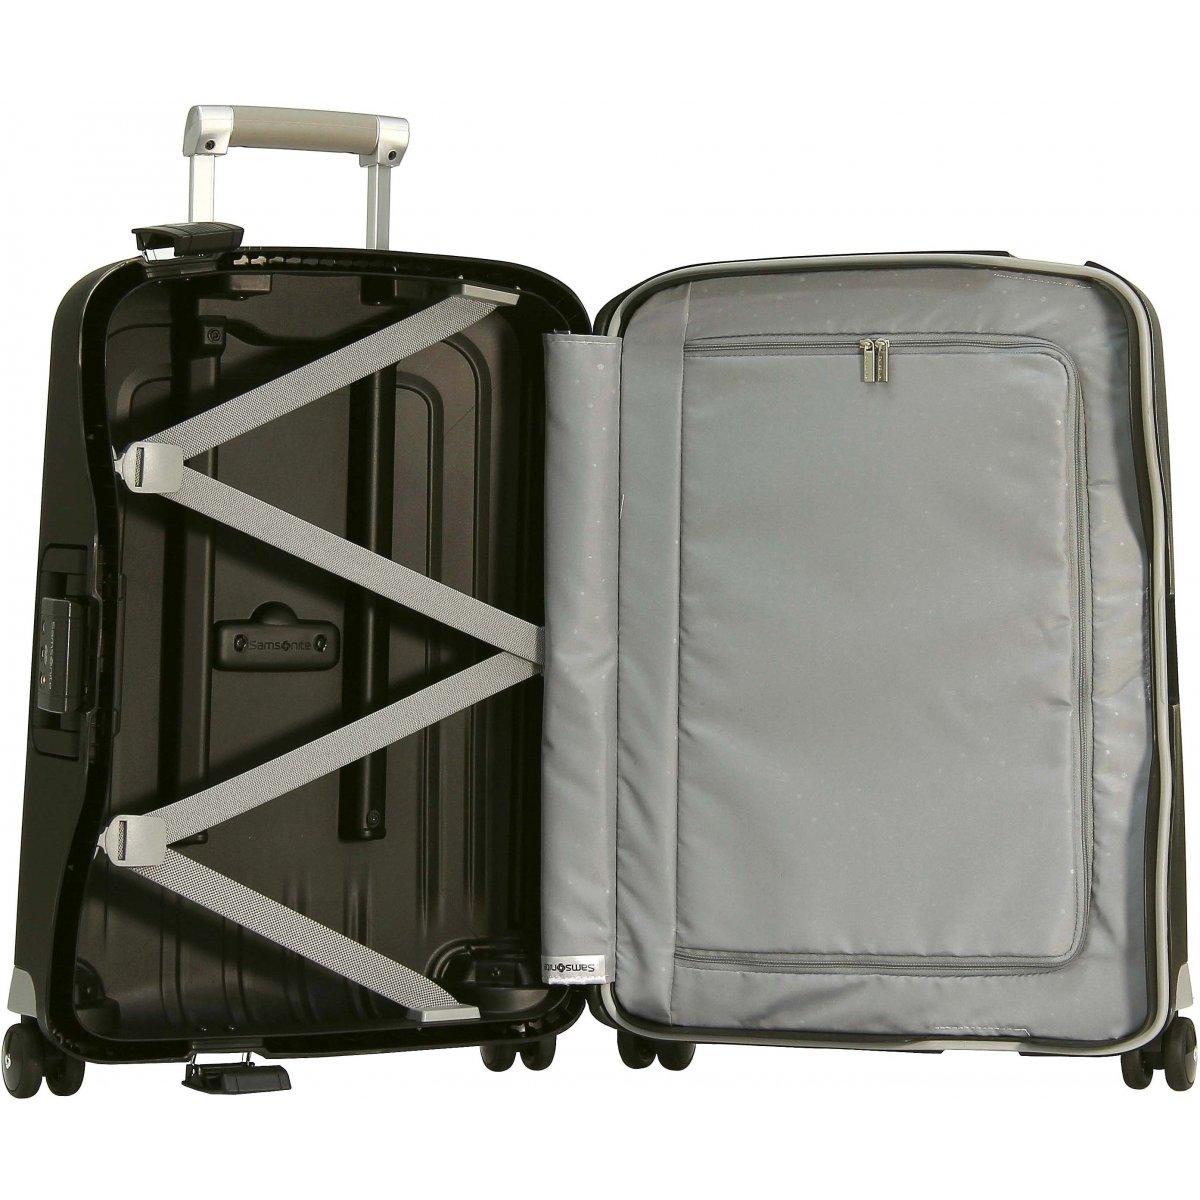 valise cabine samsonite s 39 cure spinner 55cm scure39 couleur principale noir valise pas. Black Bedroom Furniture Sets. Home Design Ideas